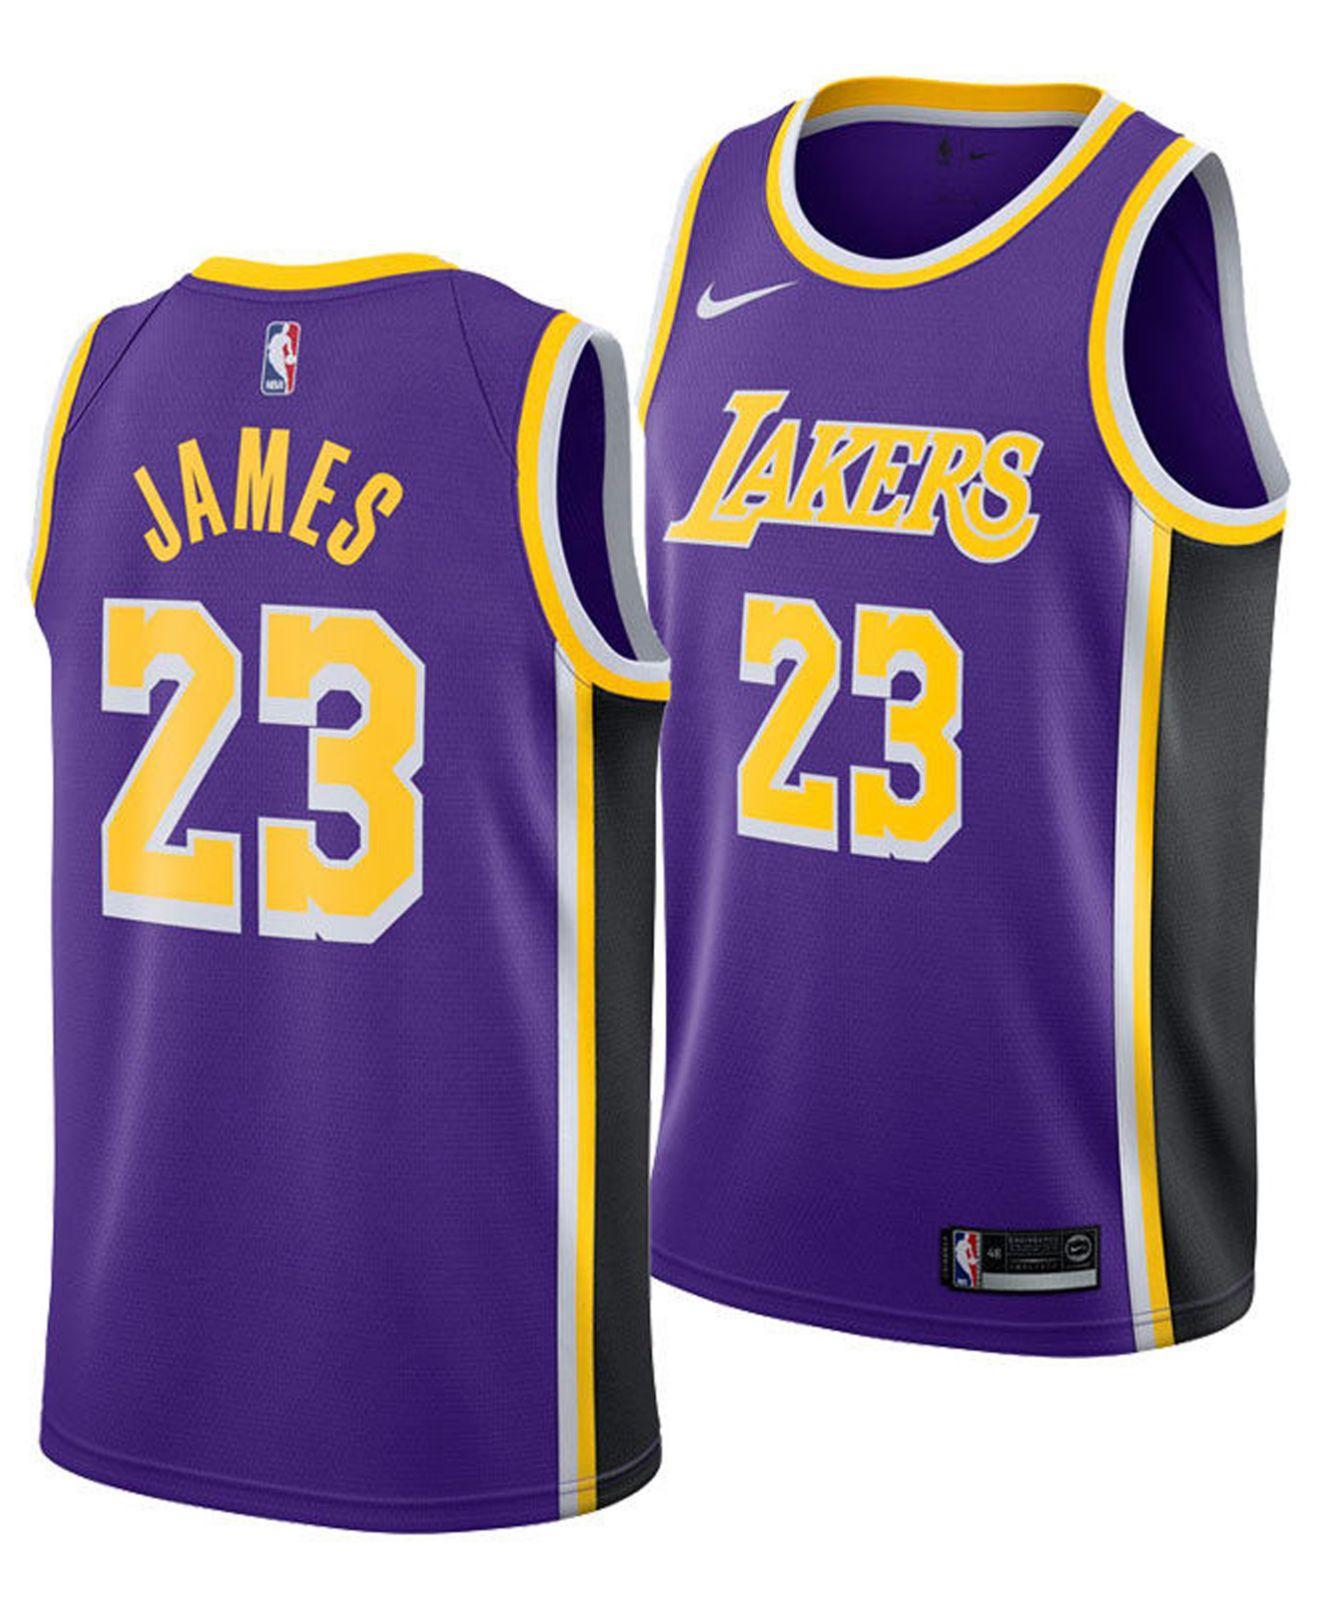 4bdf7af75358 Nike. Purple Lebron James Los Angeles Lakers Statement Swingman Jersey